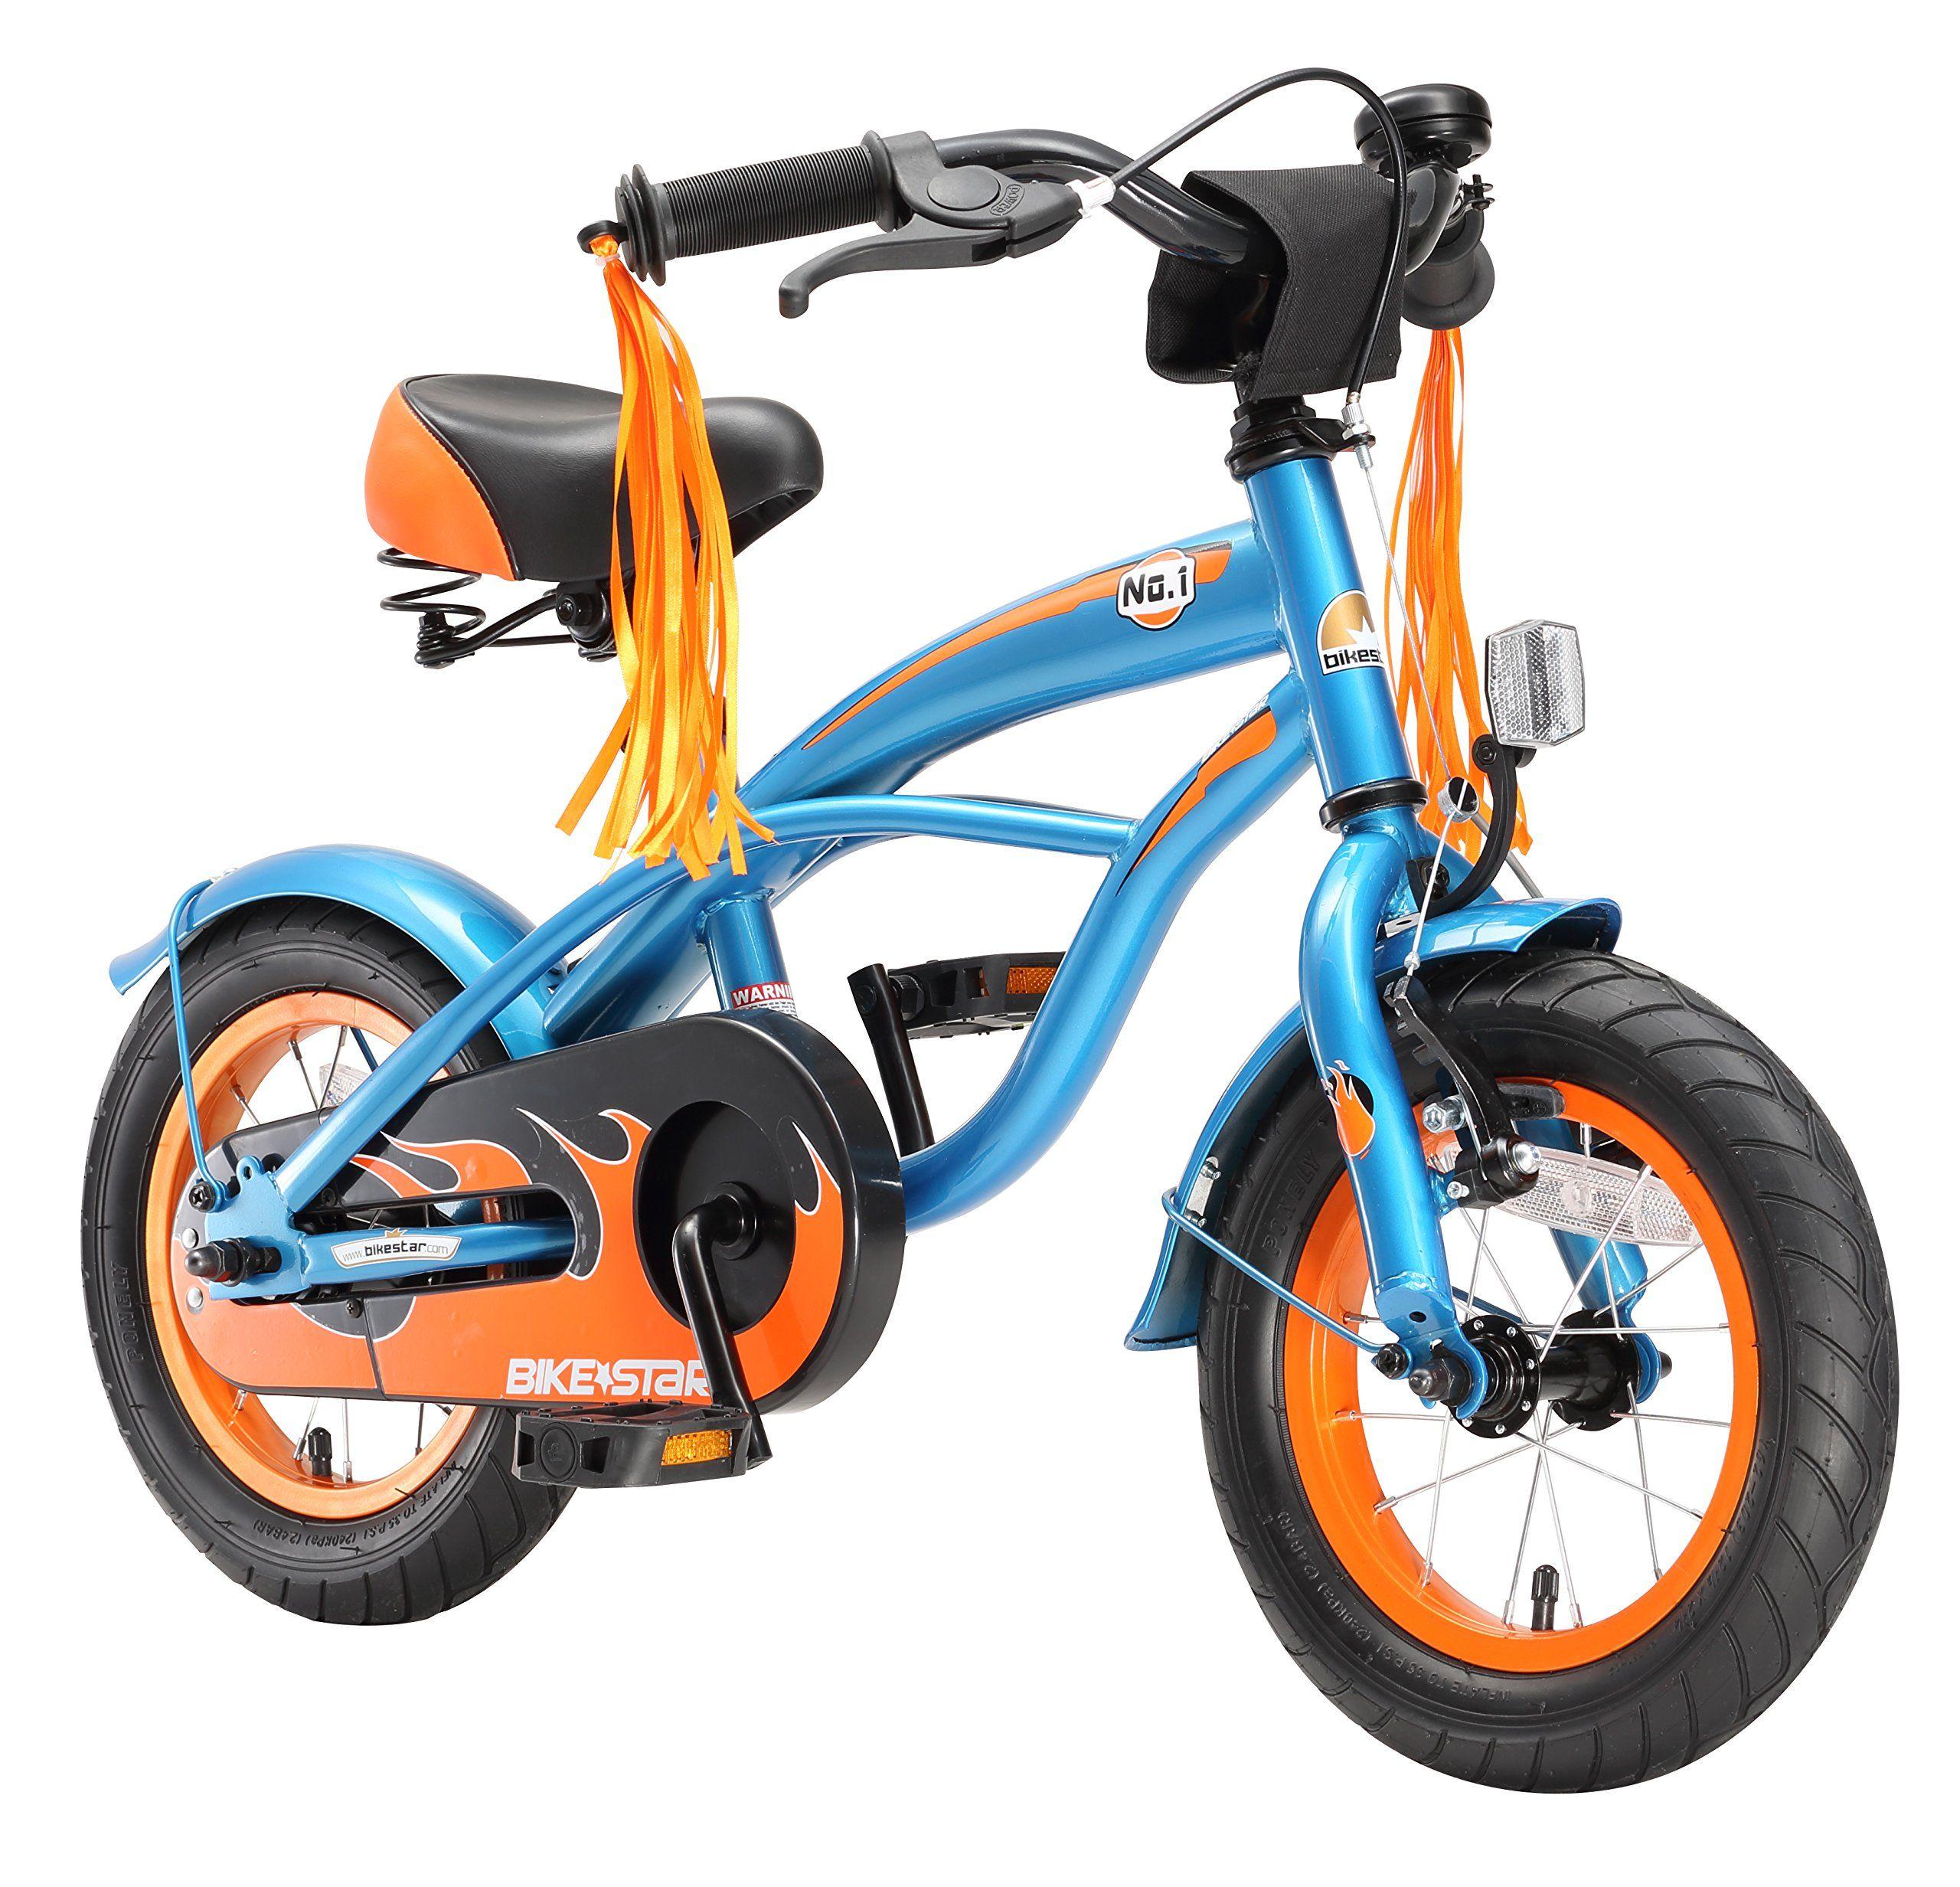 cd859517cb580 BIKESTAR® Original Premium Safety Sport Kids Bike with sidestand and  accessories for age 3 year old children